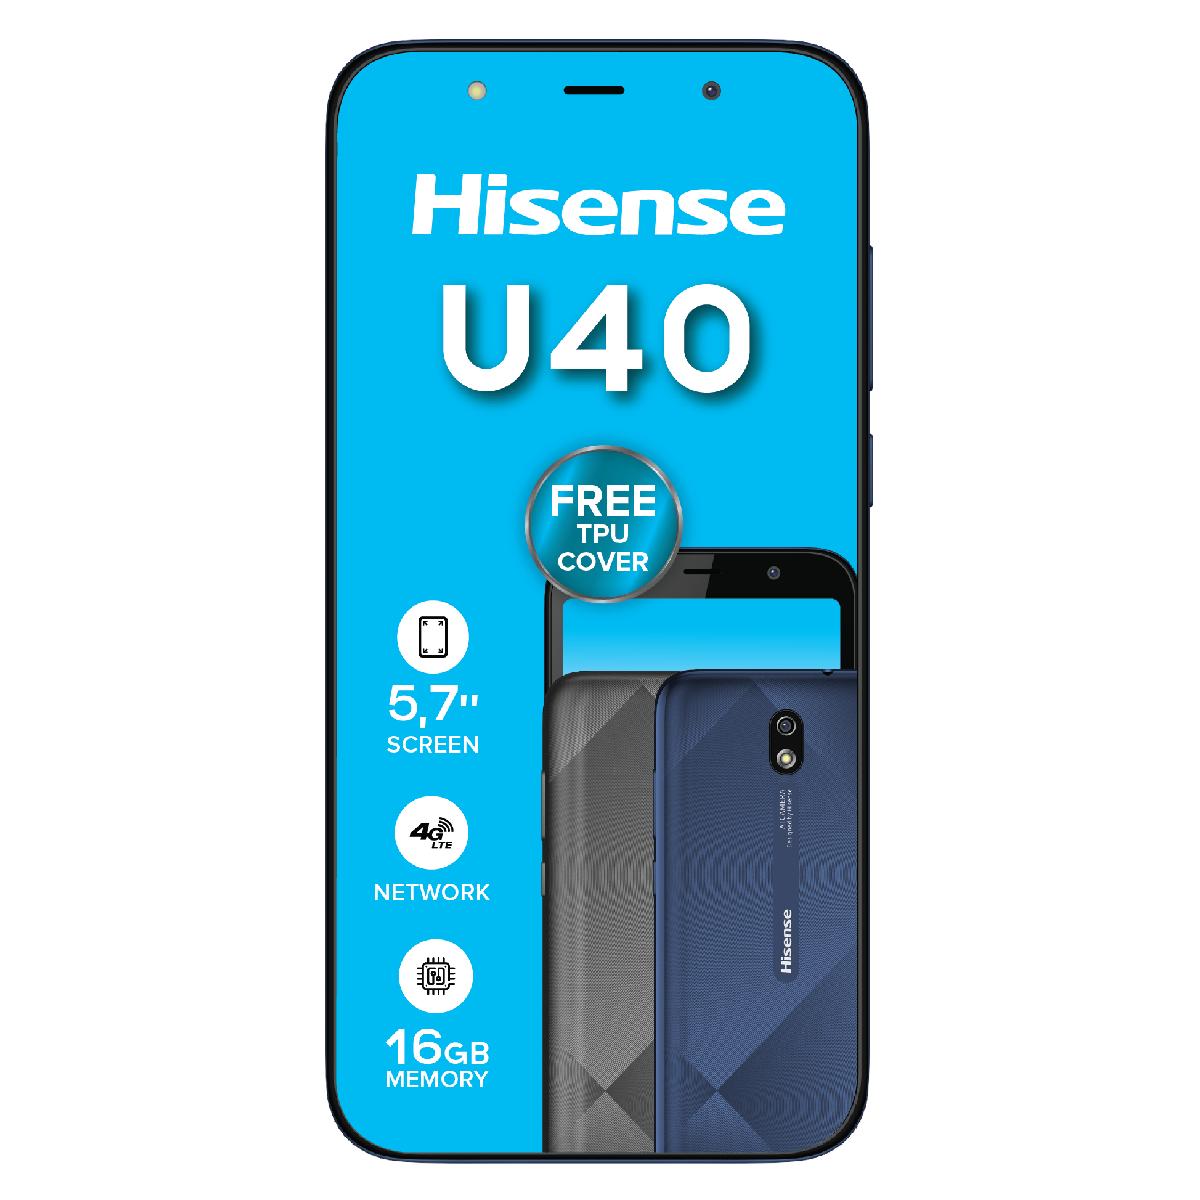 Hisense U40 (Vodacom)